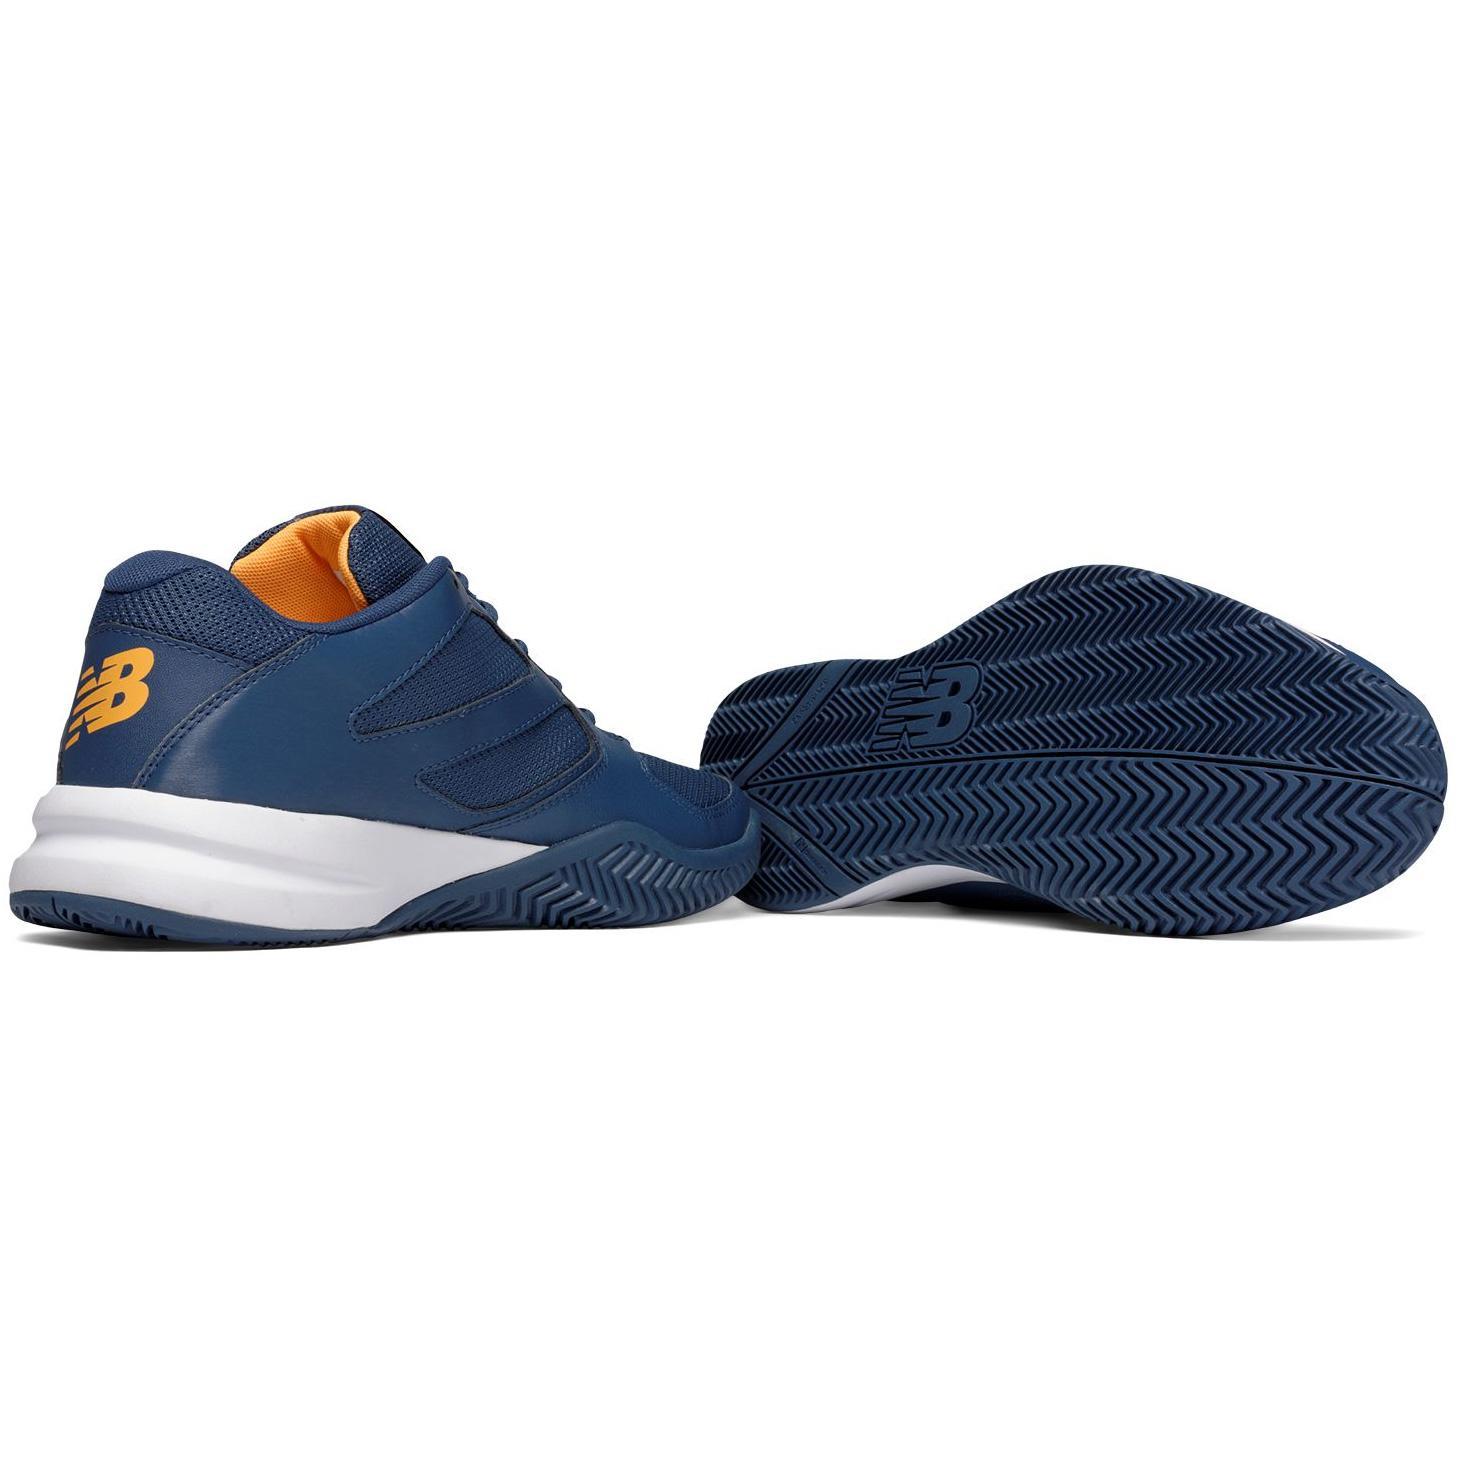 new balance tennis shoes. new balance mens 696v2 tennis shoes - blue (d) s